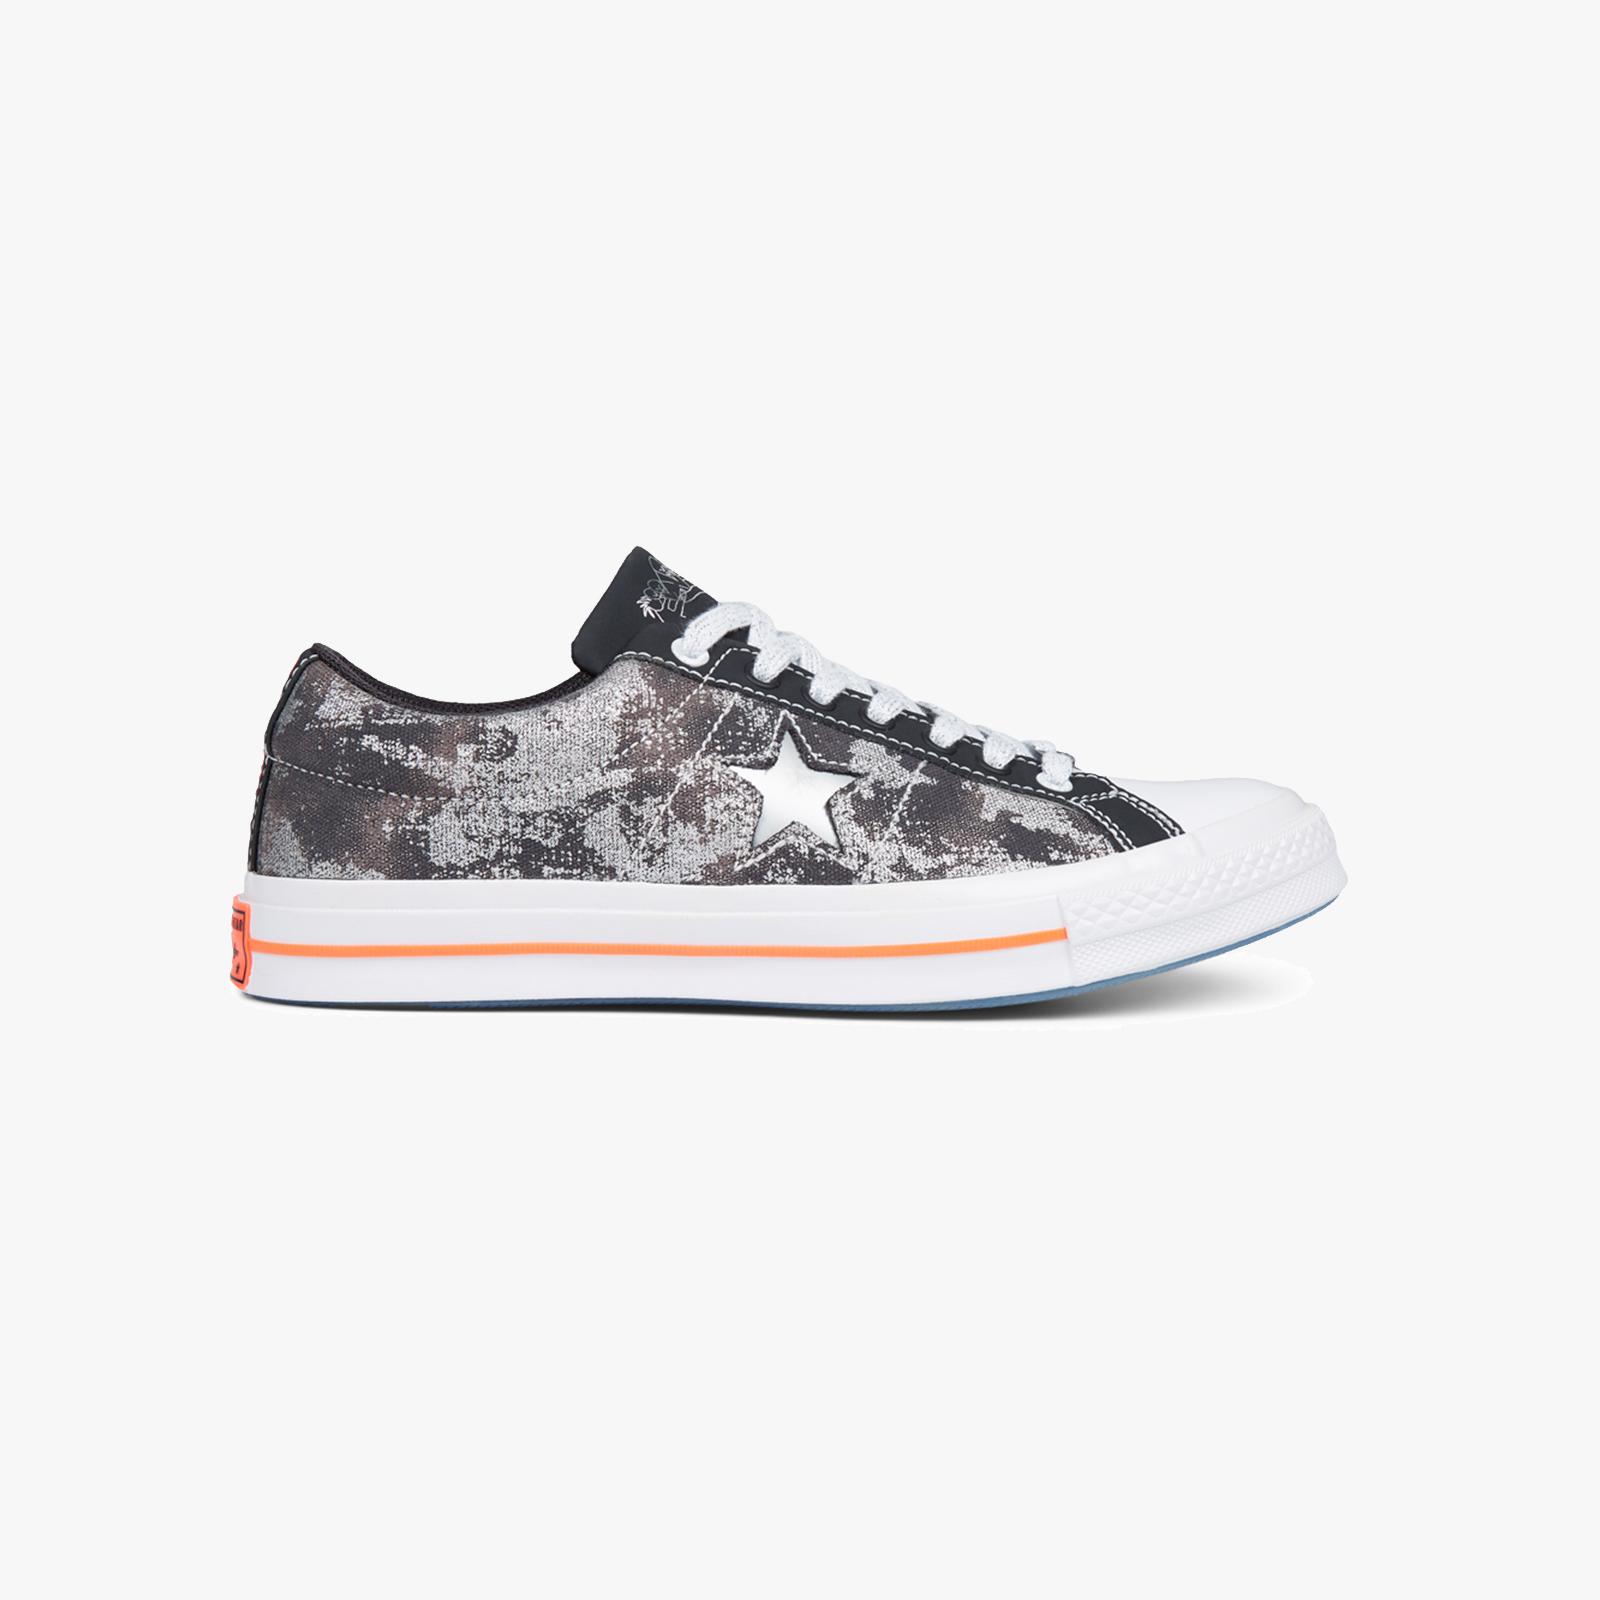 Converse One Star x Sad Boys 165743c Sneakersnstuff I